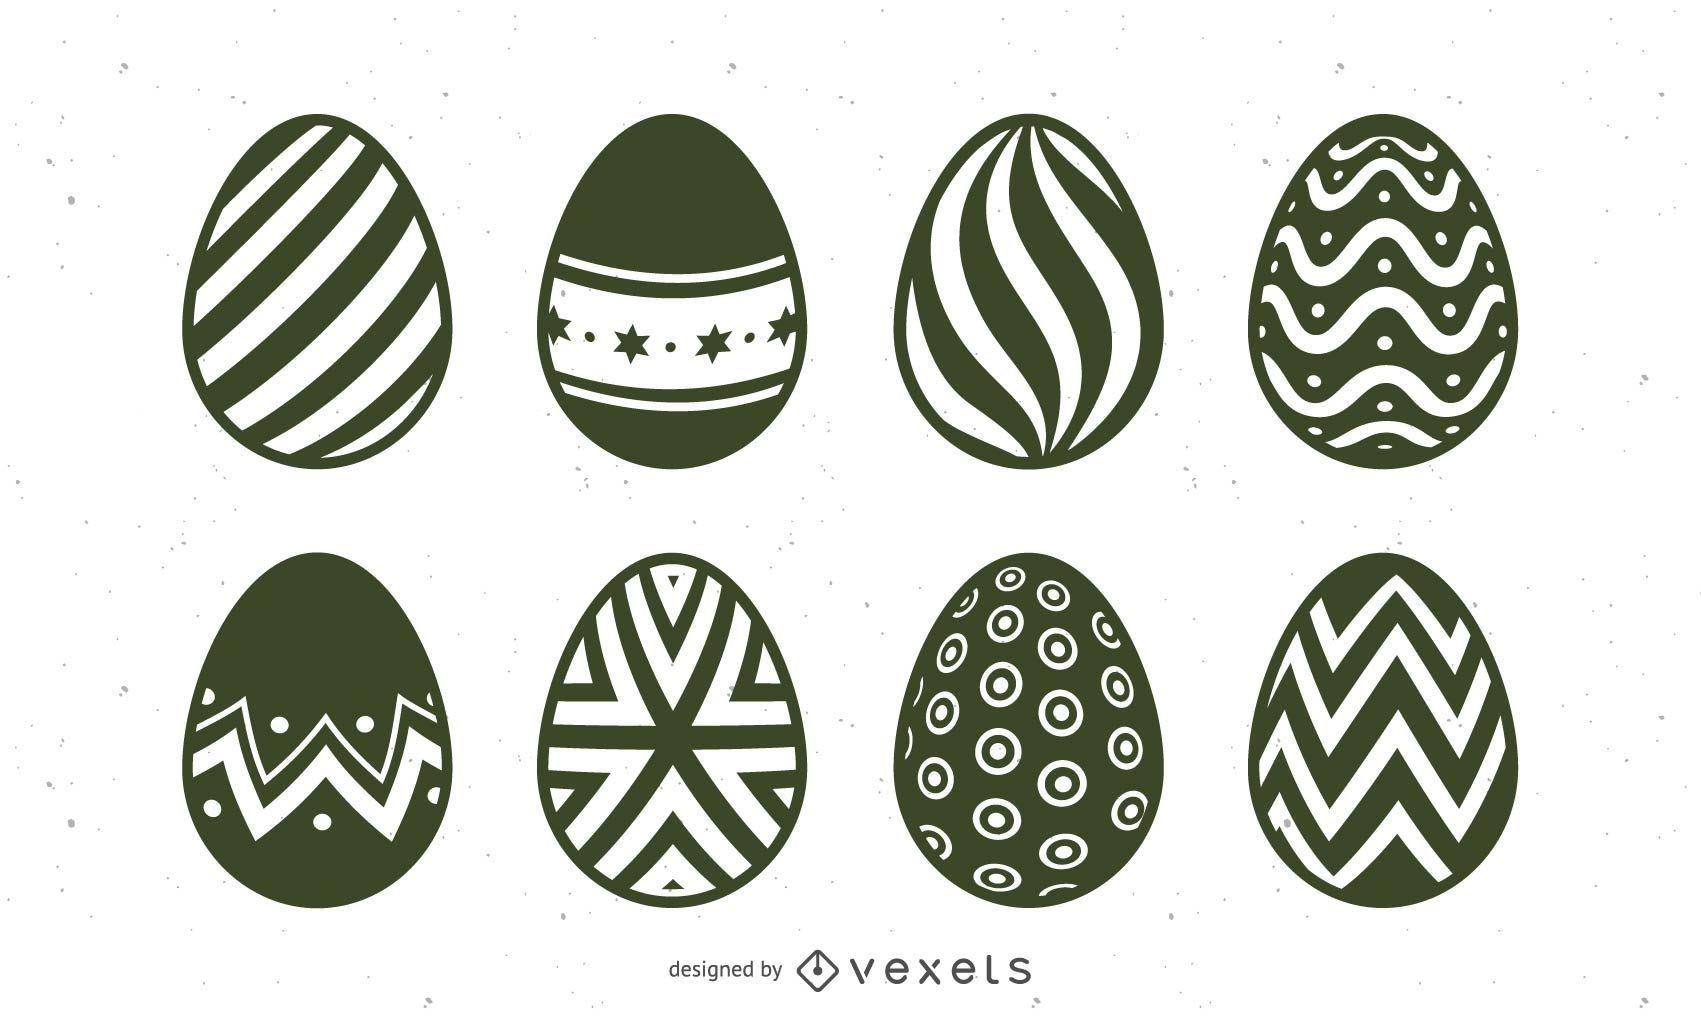 Hand Drawn Easter Egg Illustration Set